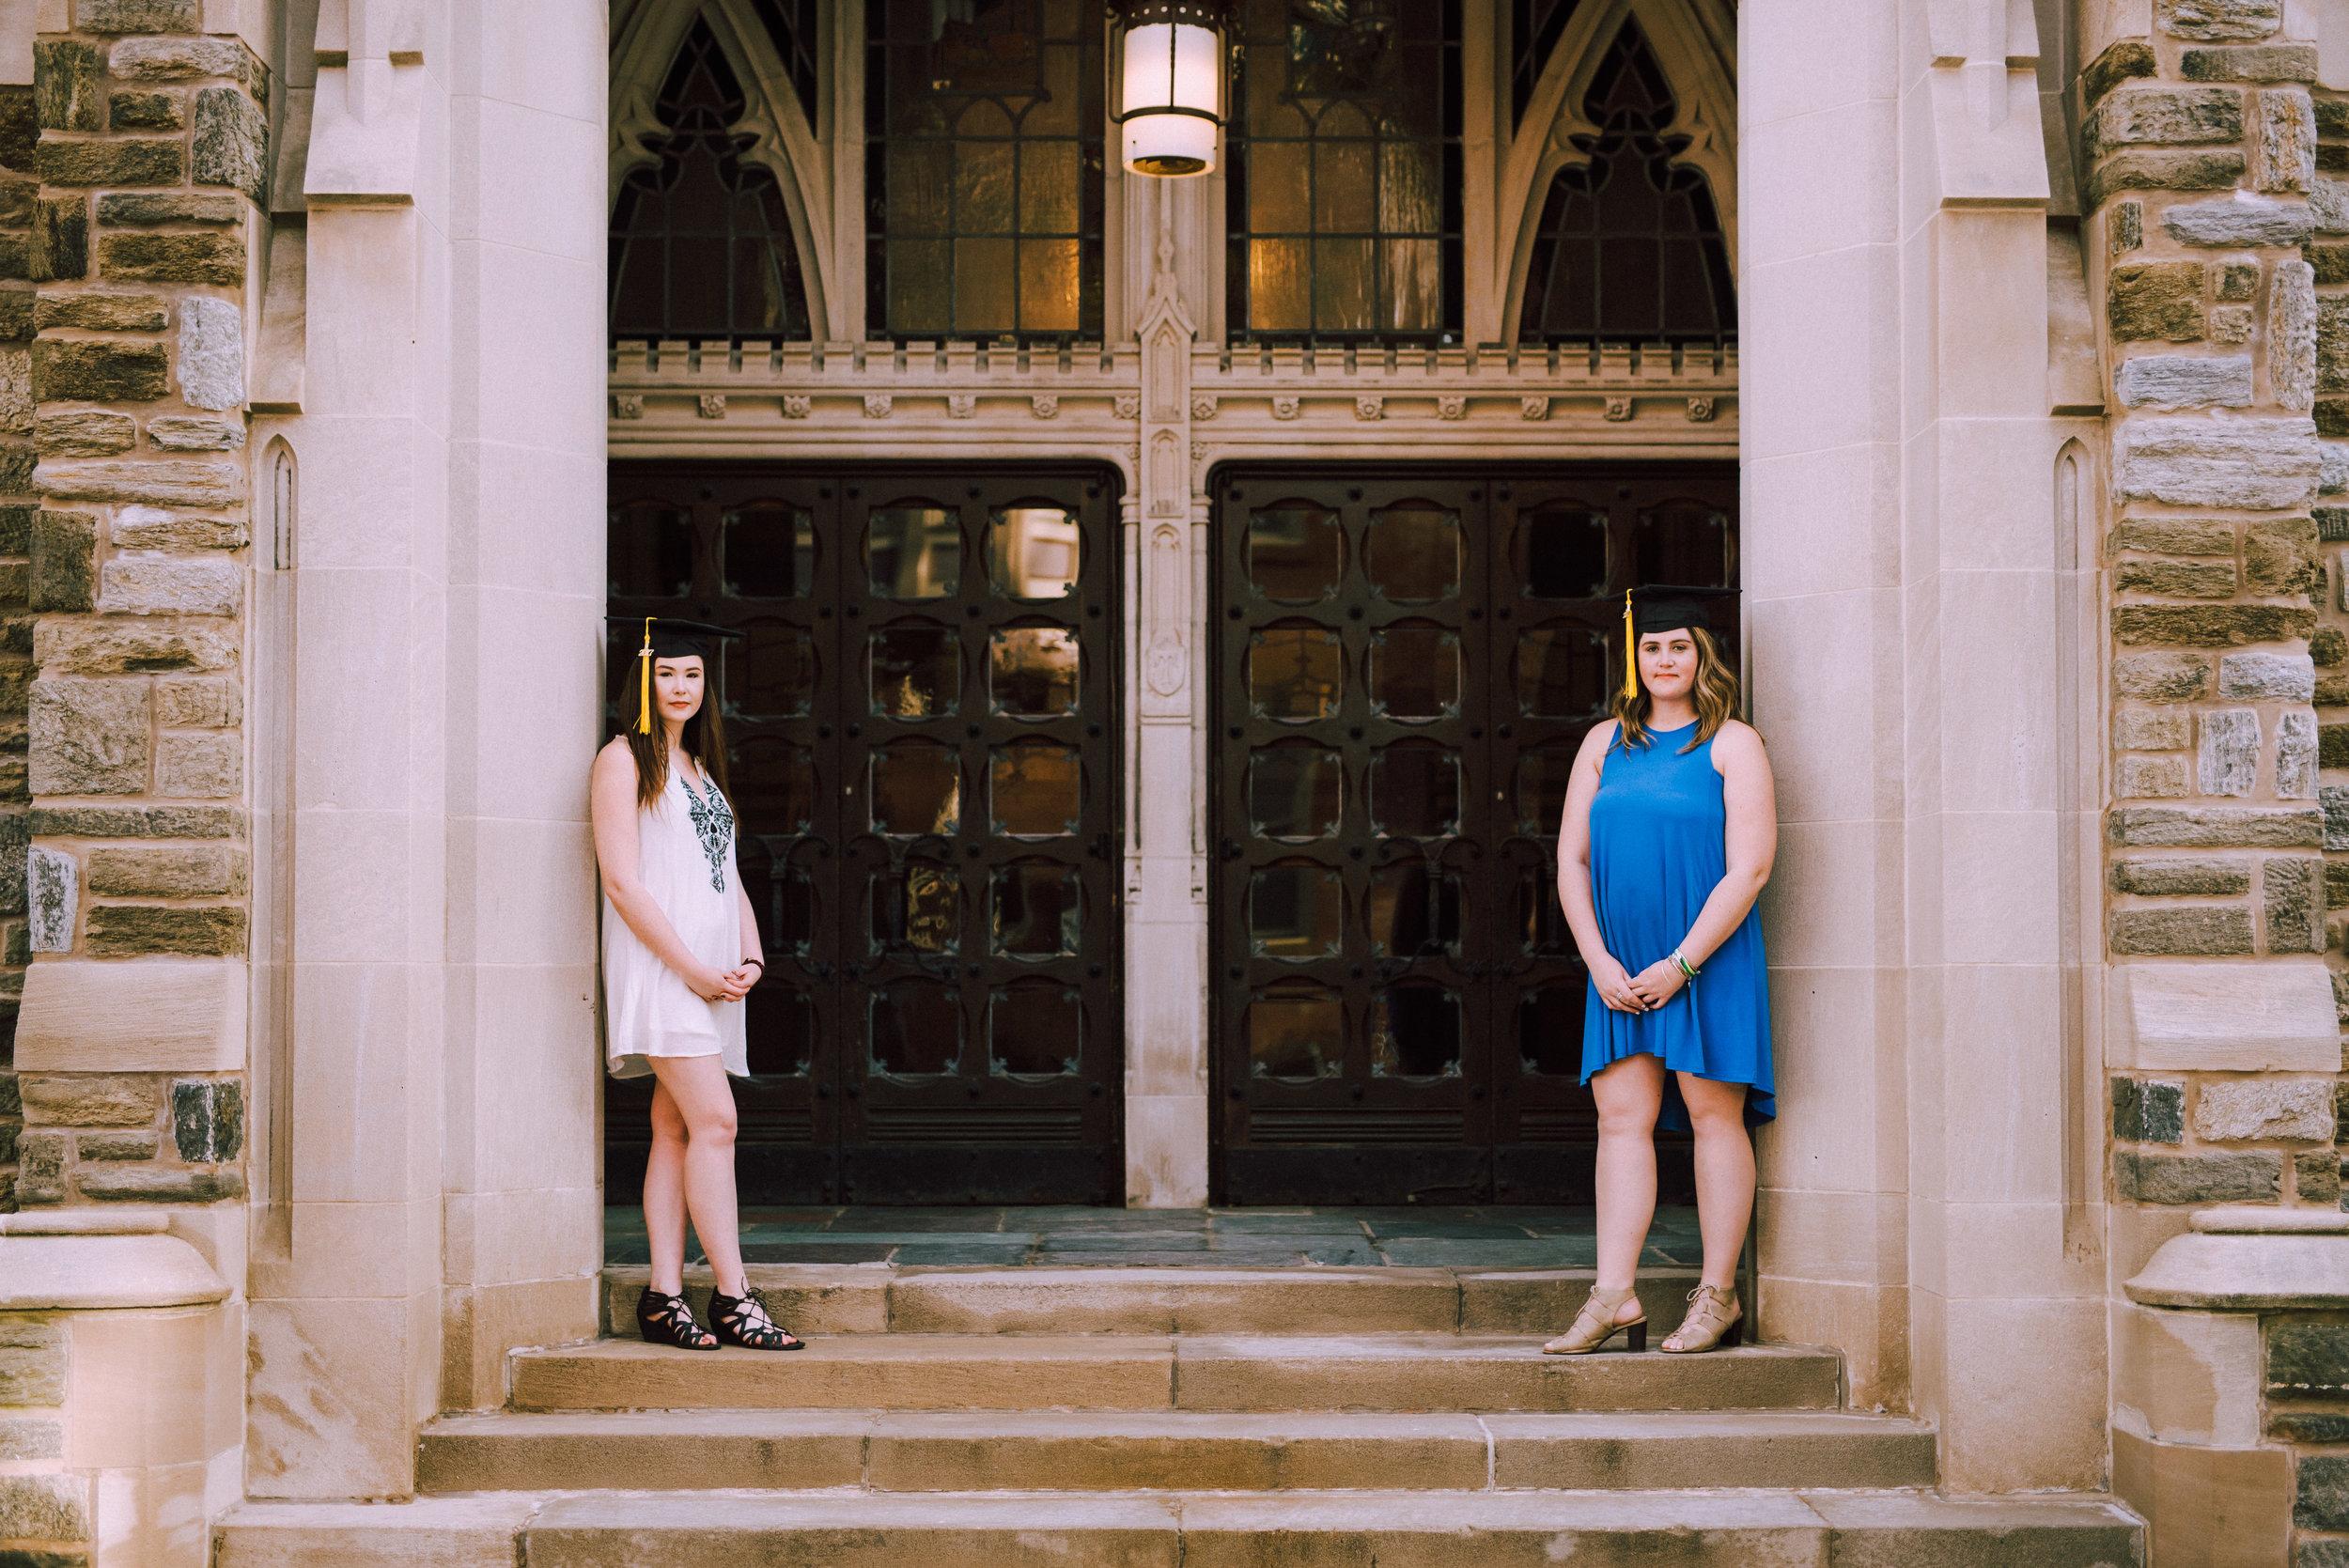 Courtney&Kate-128.jpg